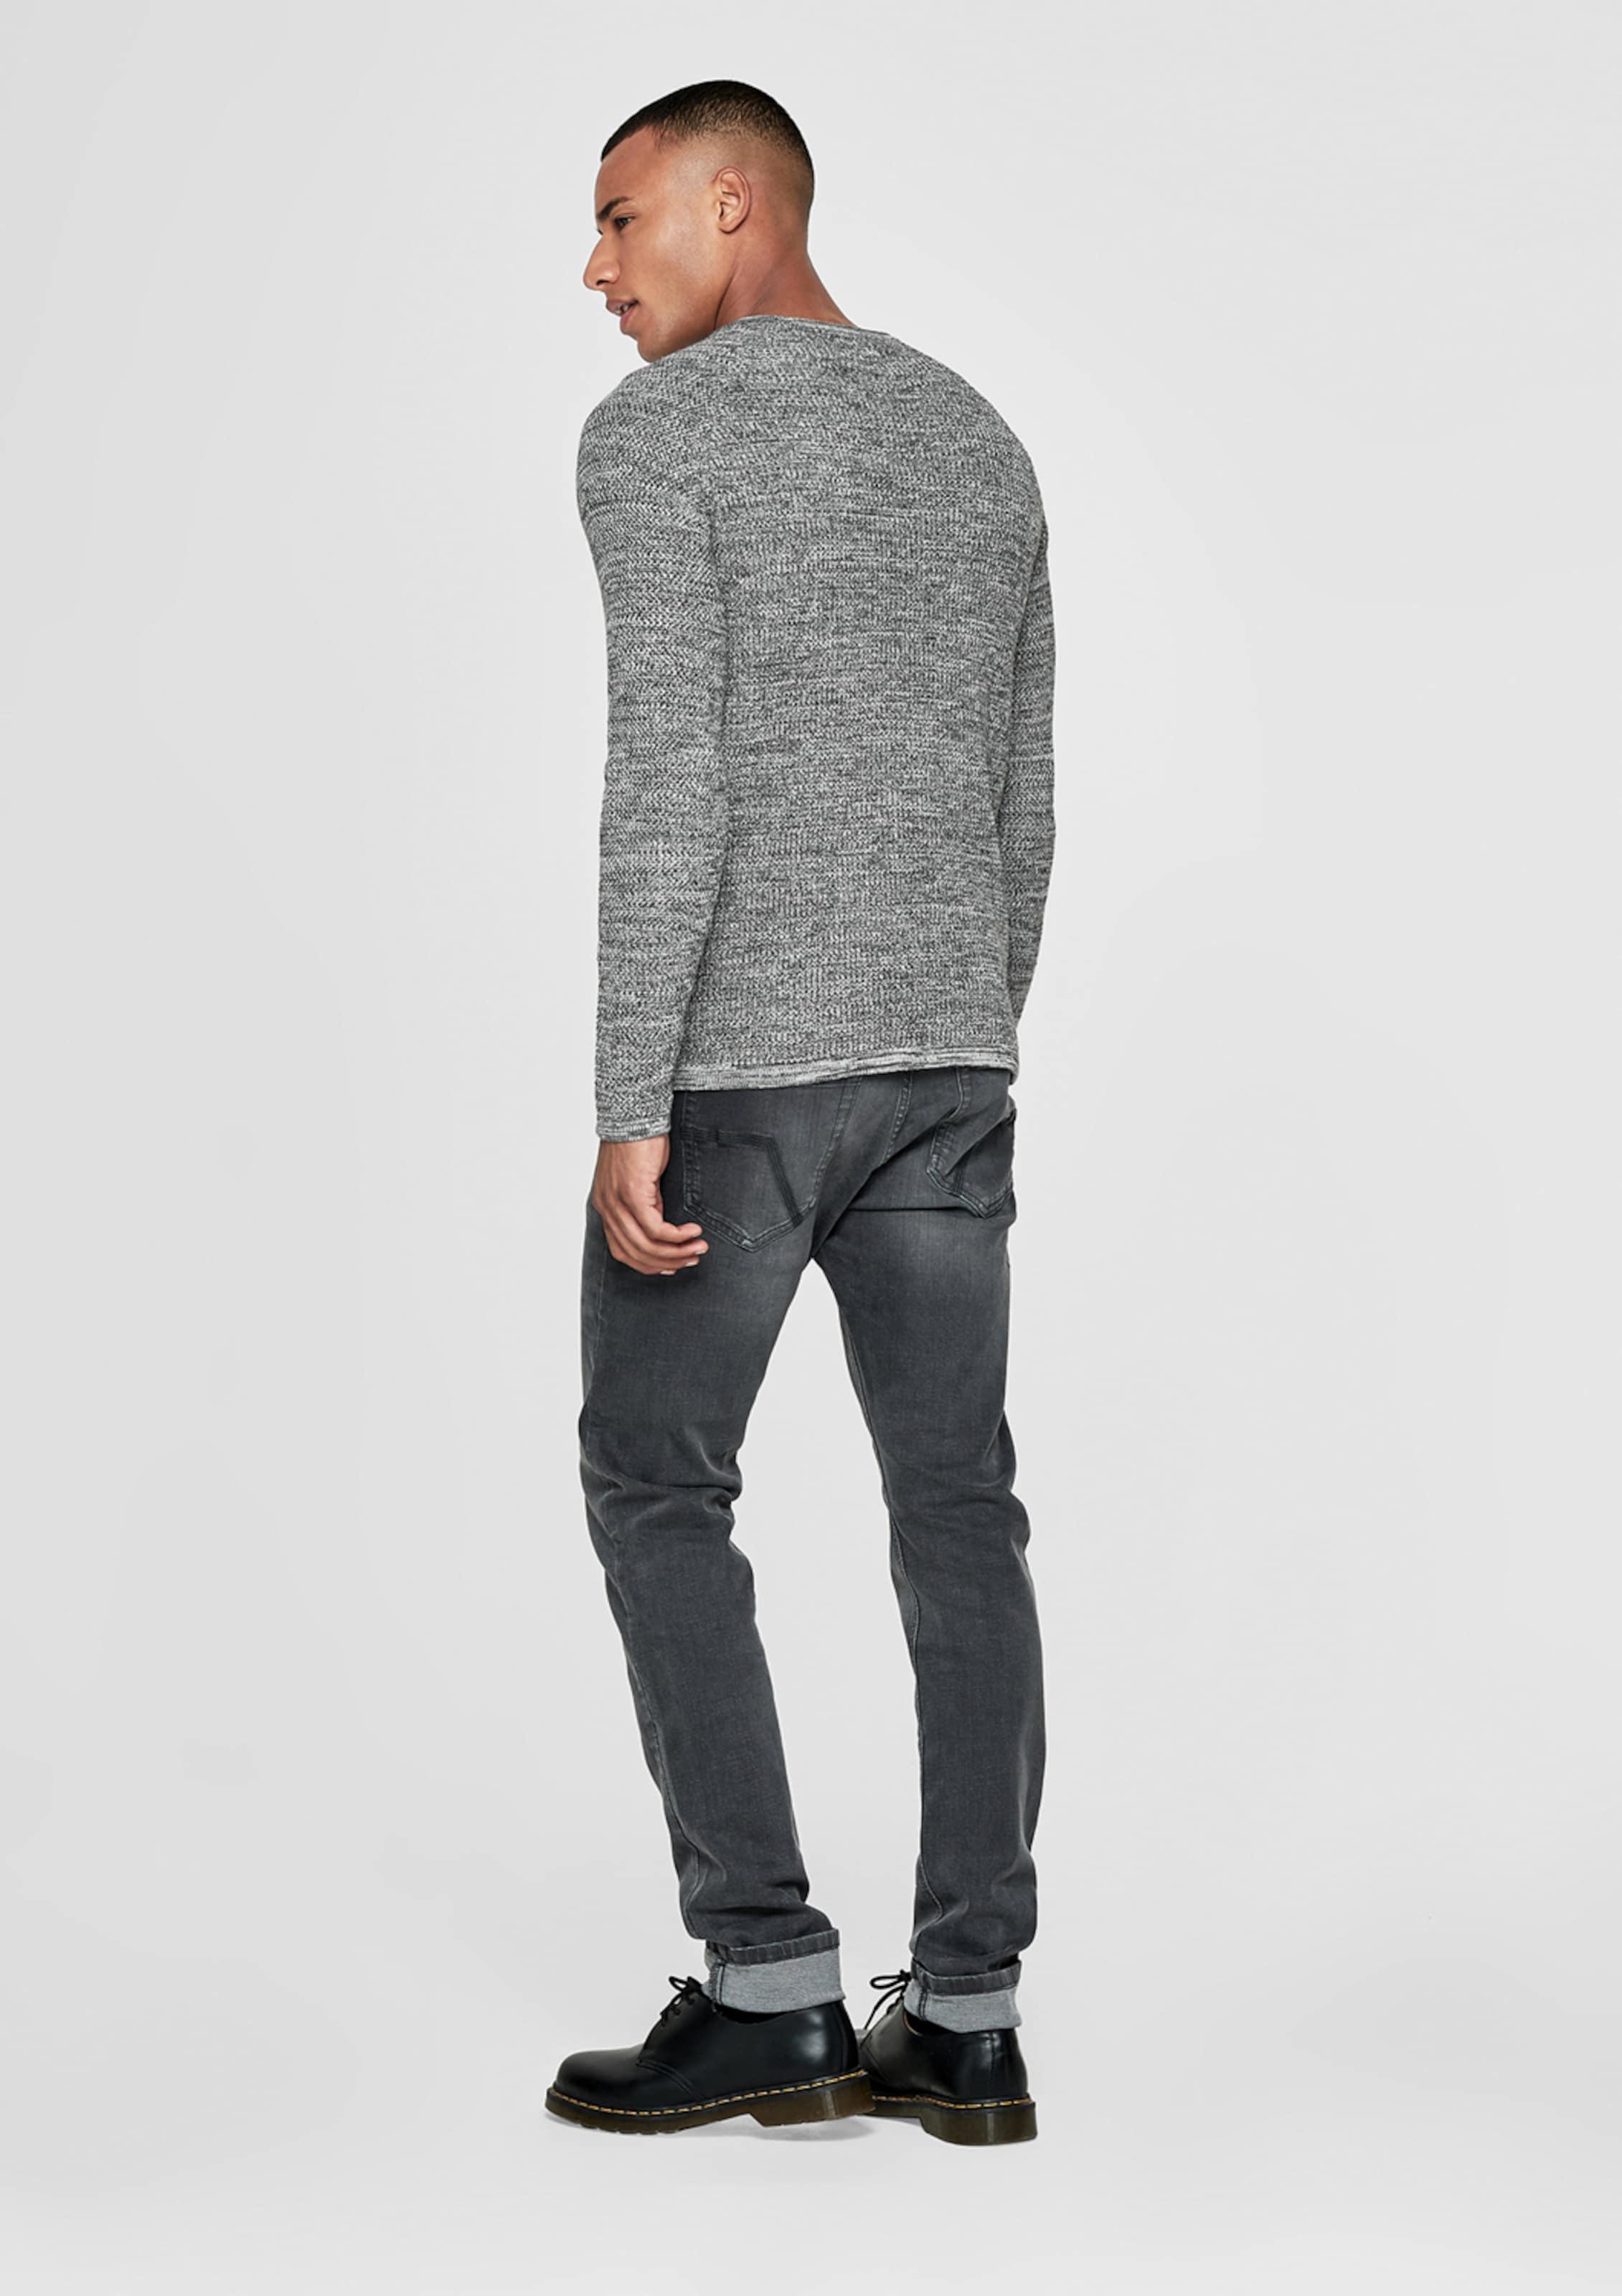 In Pullover Q Grau By Designed s X0wk8PnO